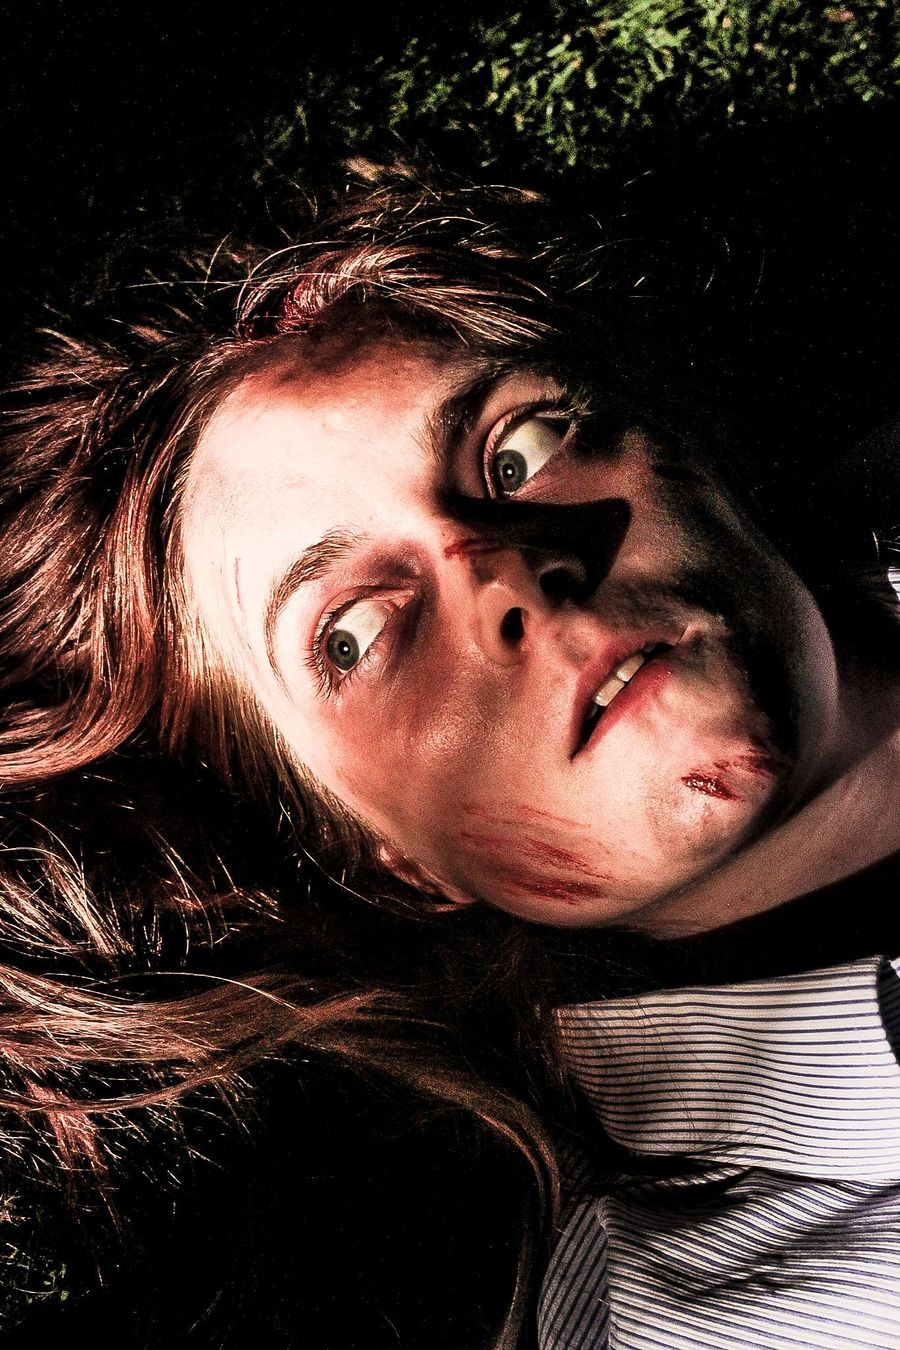 Lunatic / Model The Paranormal Student, Makeup by Kiri Kosmetikos HMUA / Uploaded 25th August 2020 @ 06:38 PM